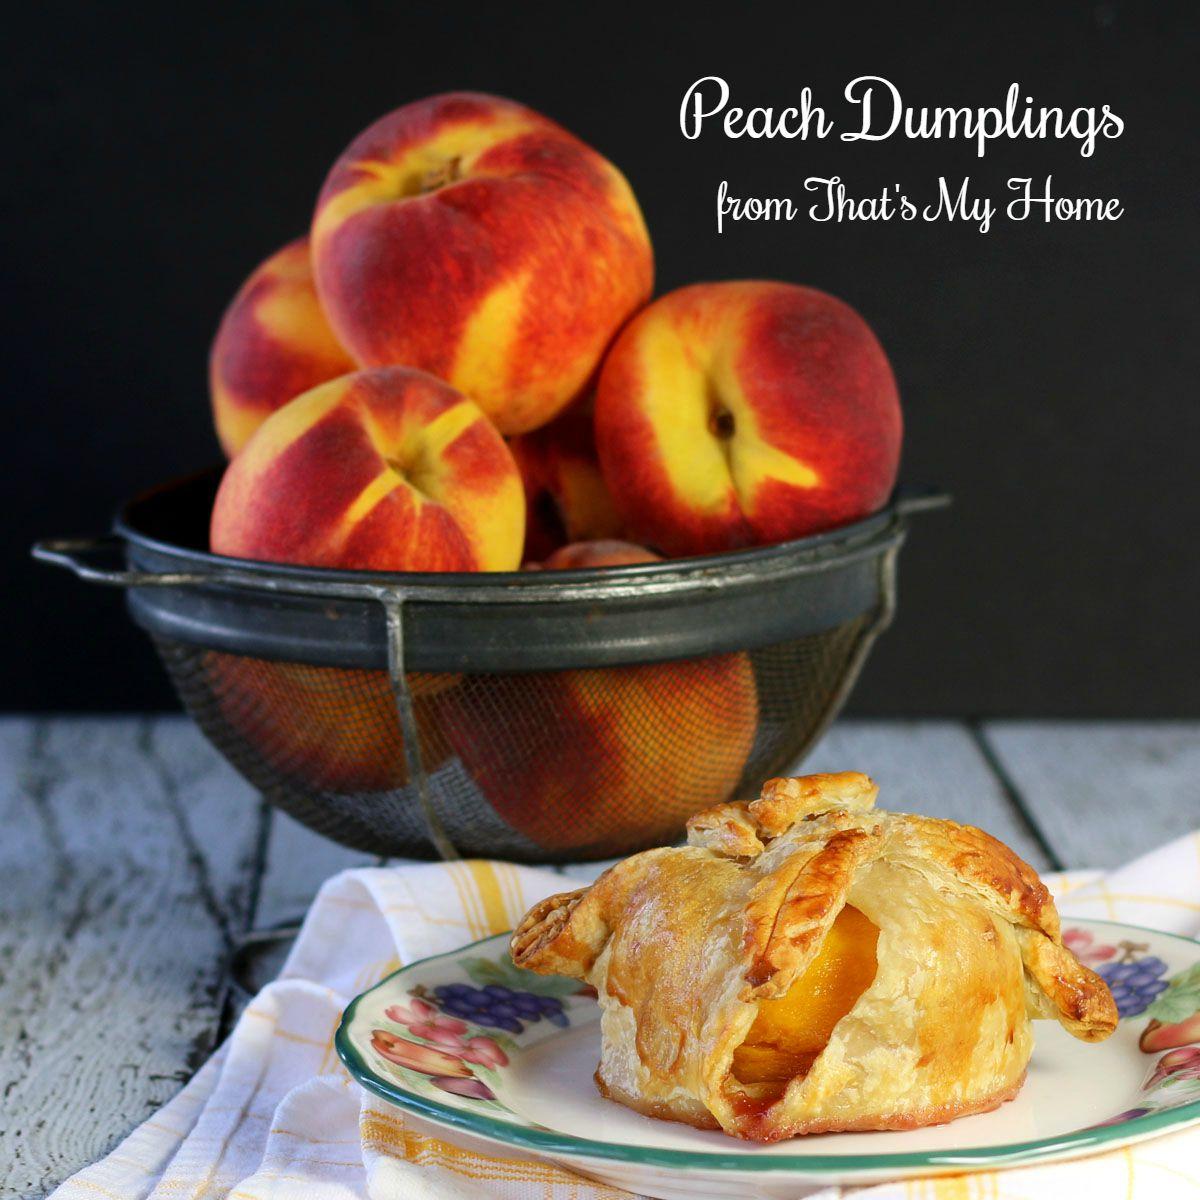 Old fashioned apple dumpling recipe 77